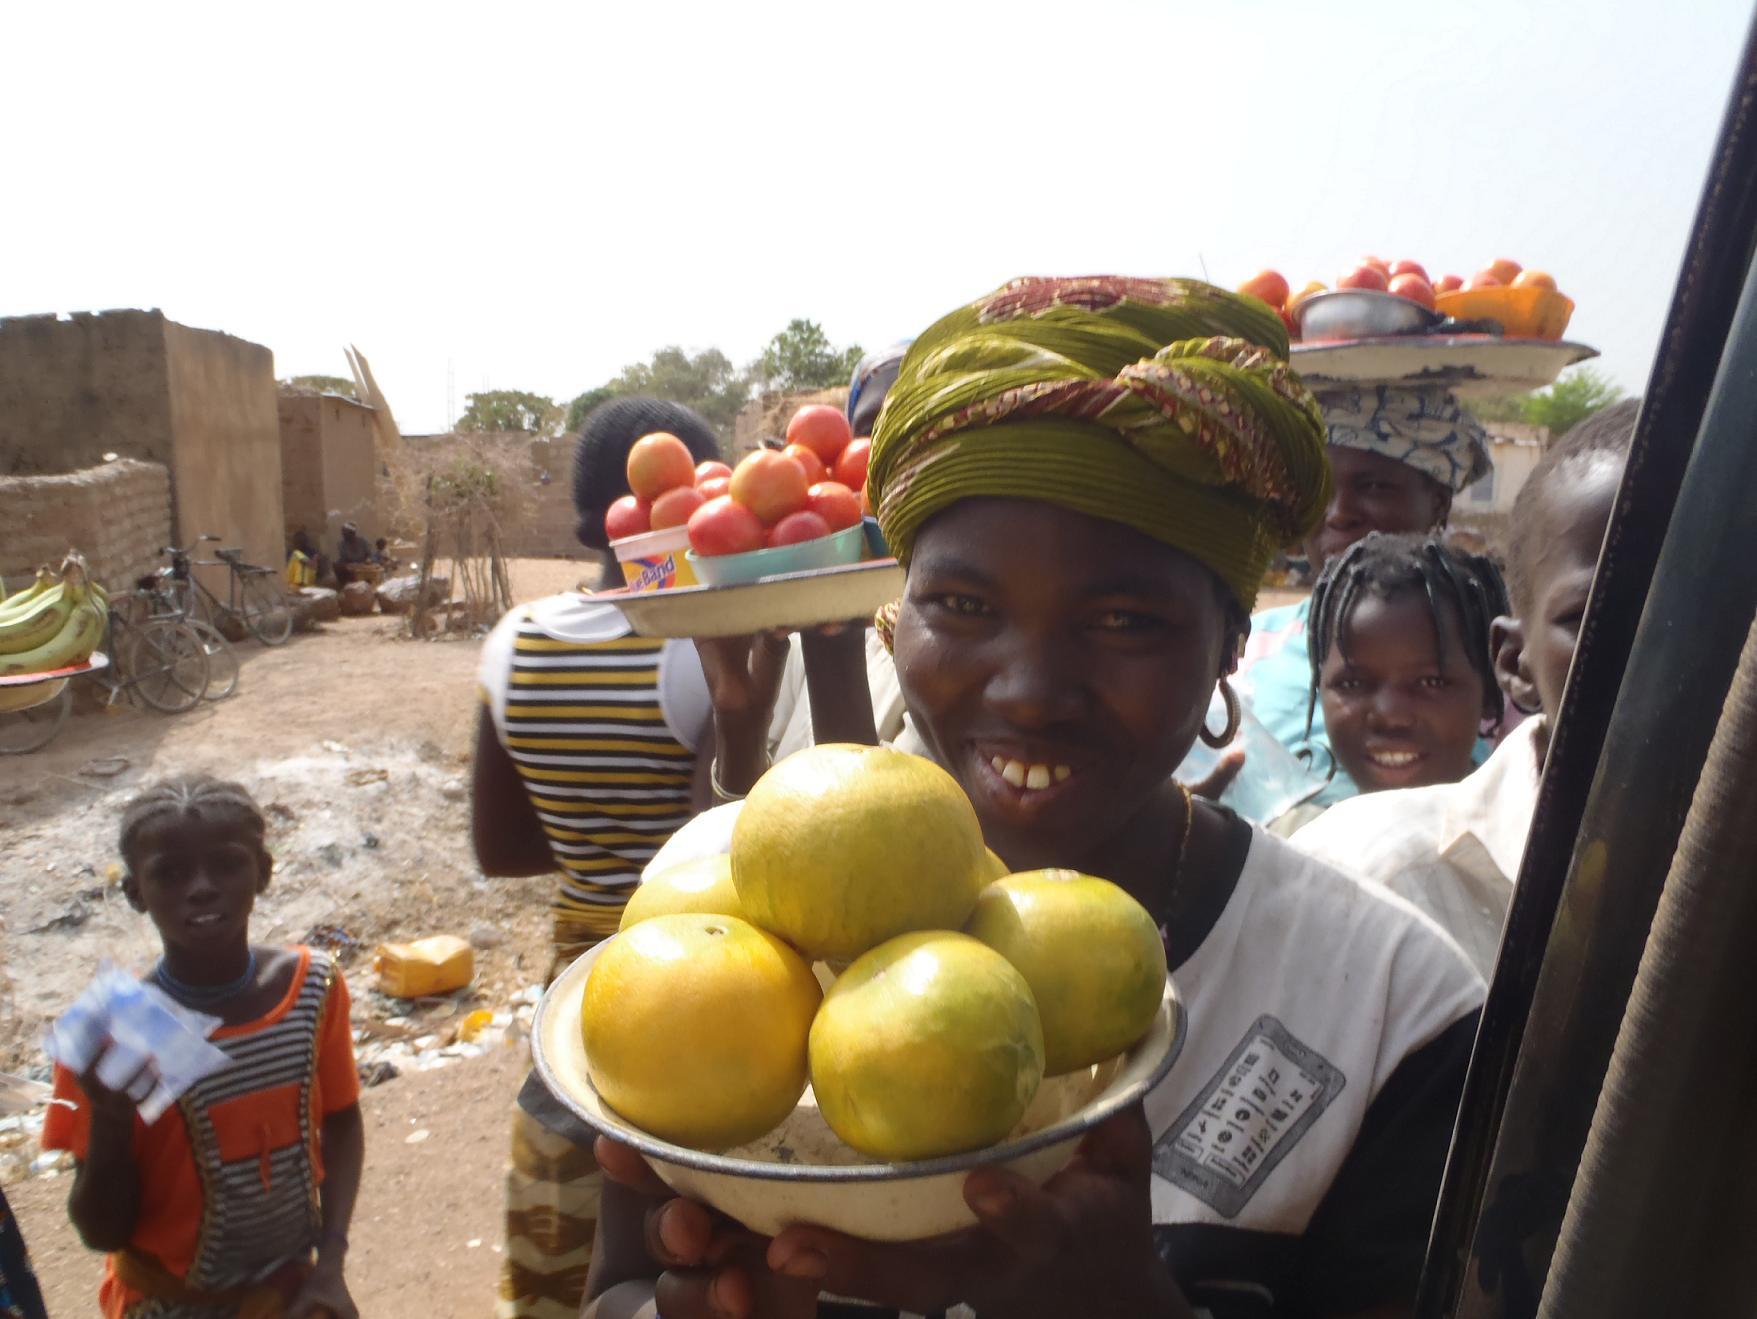 Vente de fruits en bord de route